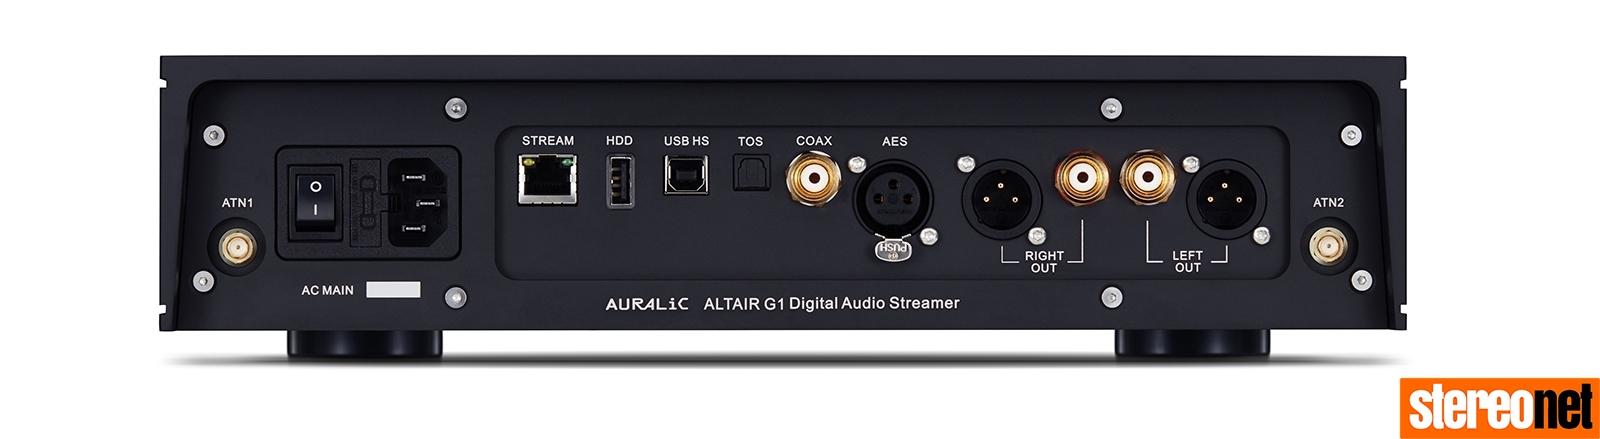 AURALiC Altair G1 Review